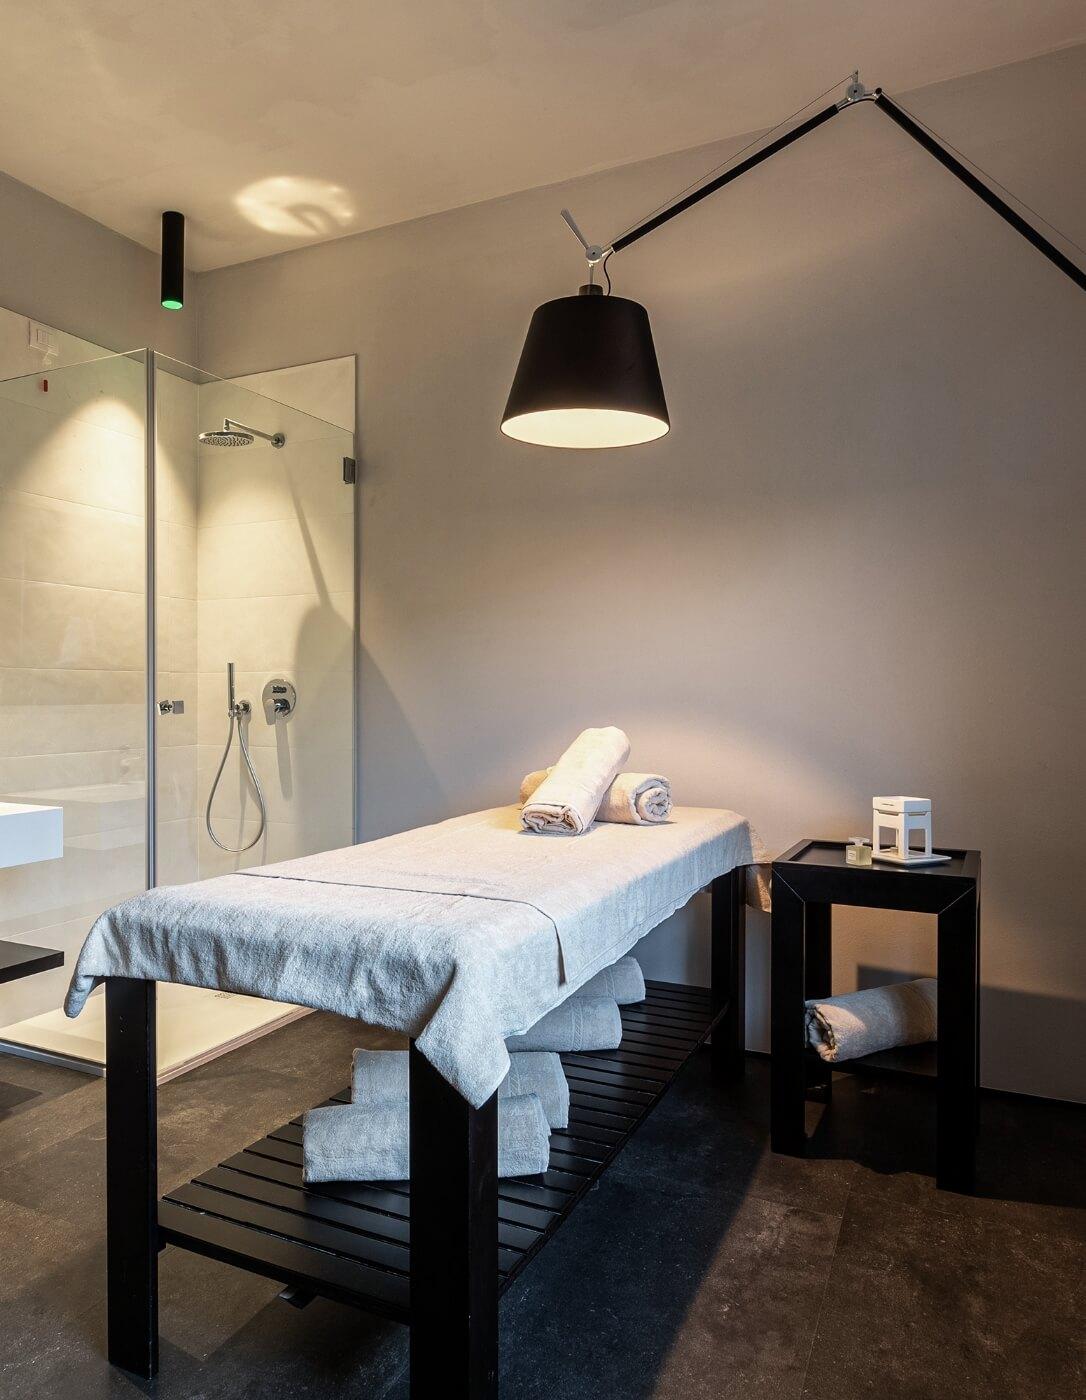 Gotí Hotel Spa Massaggi Cover Image